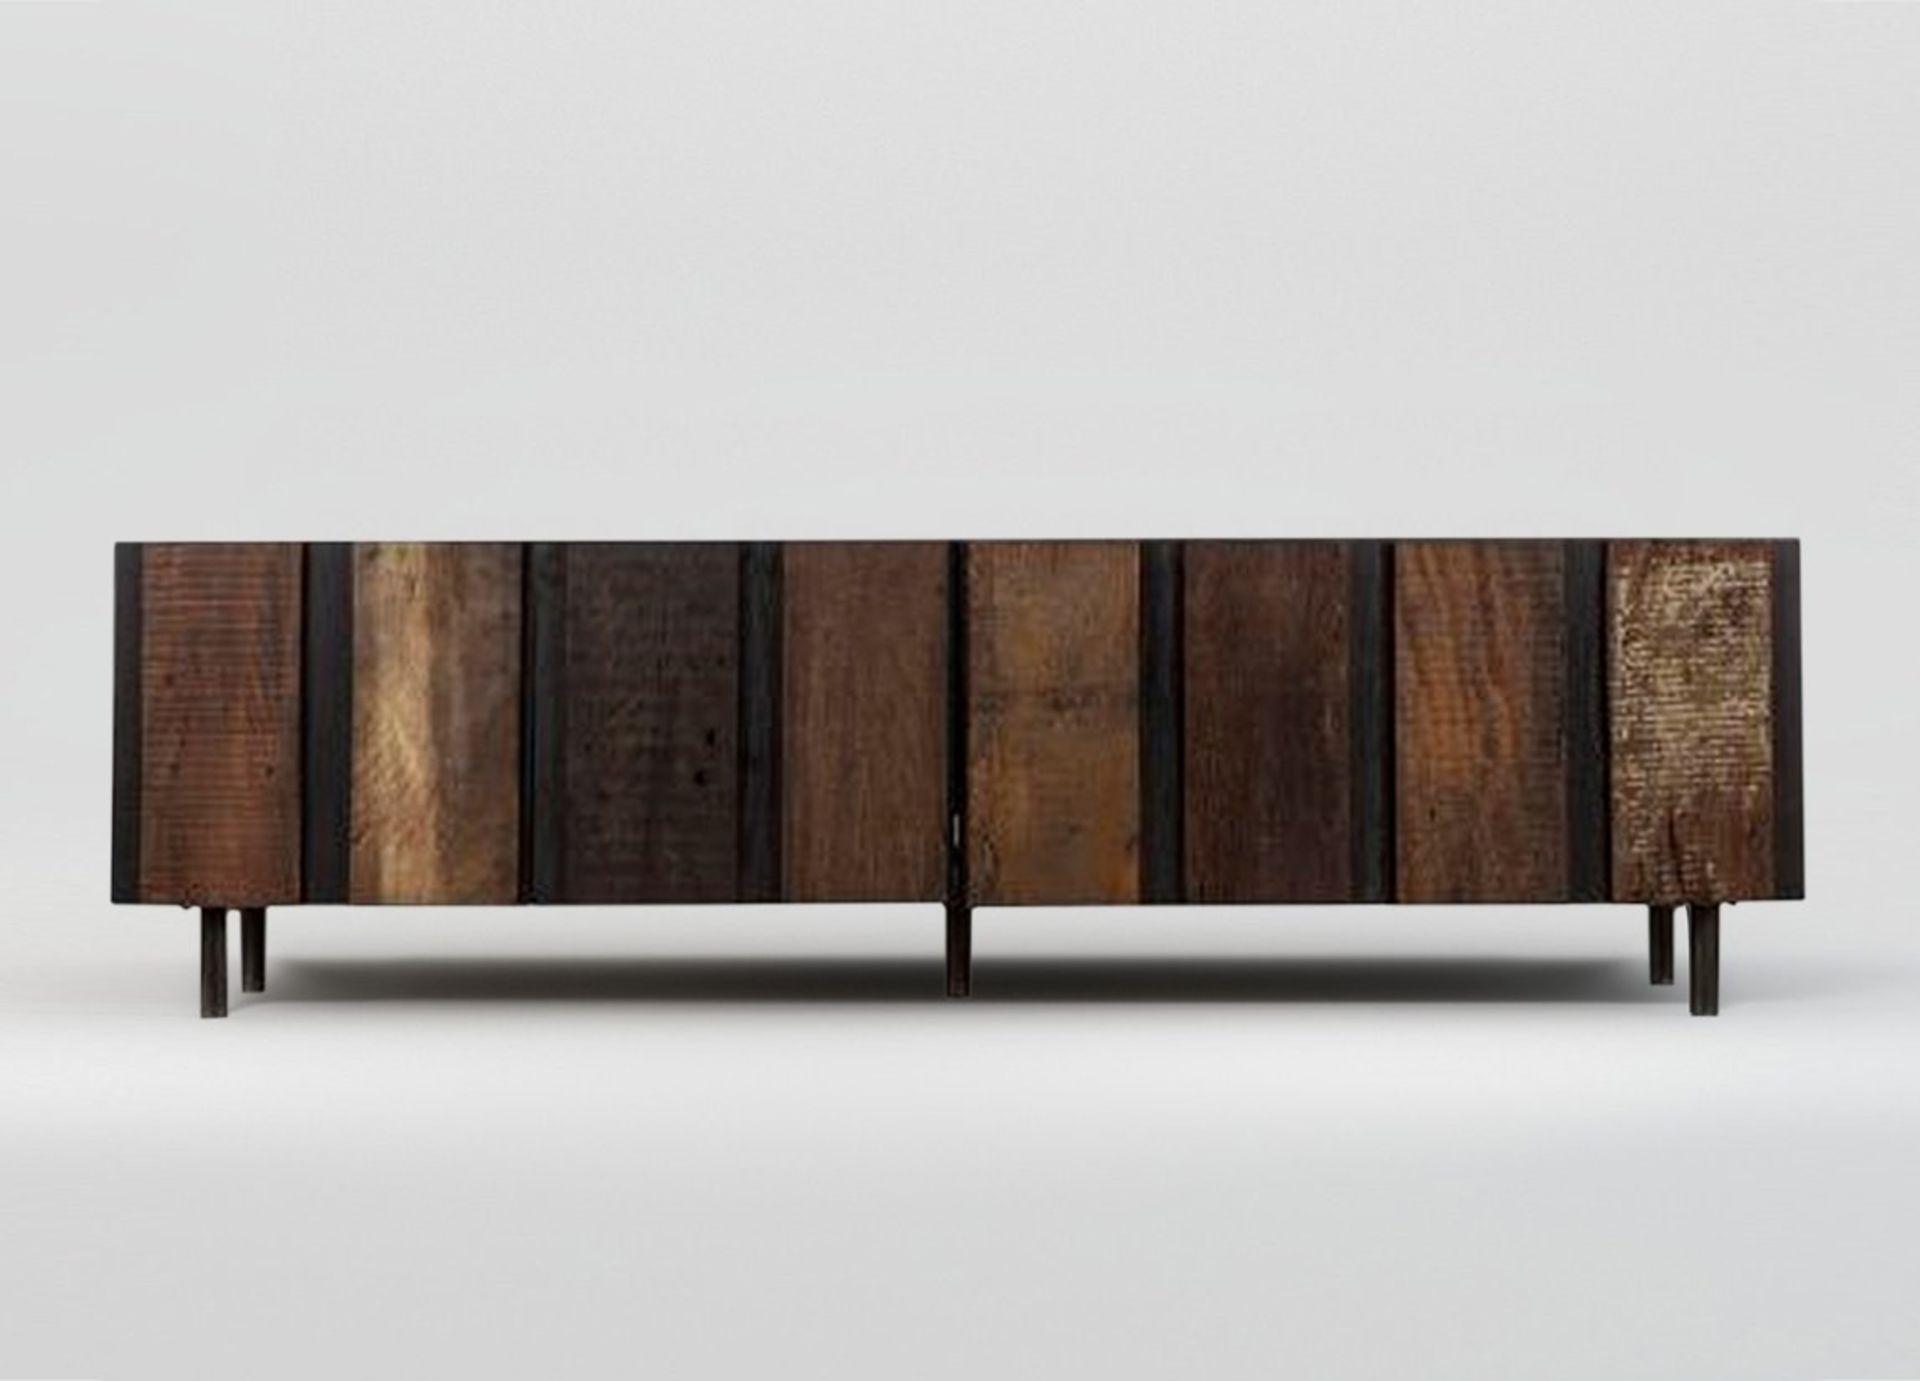 Thomas Bina Santos 4 Door Media Console Credenza Finished In Brazilian Peroba Wood and Black Oak